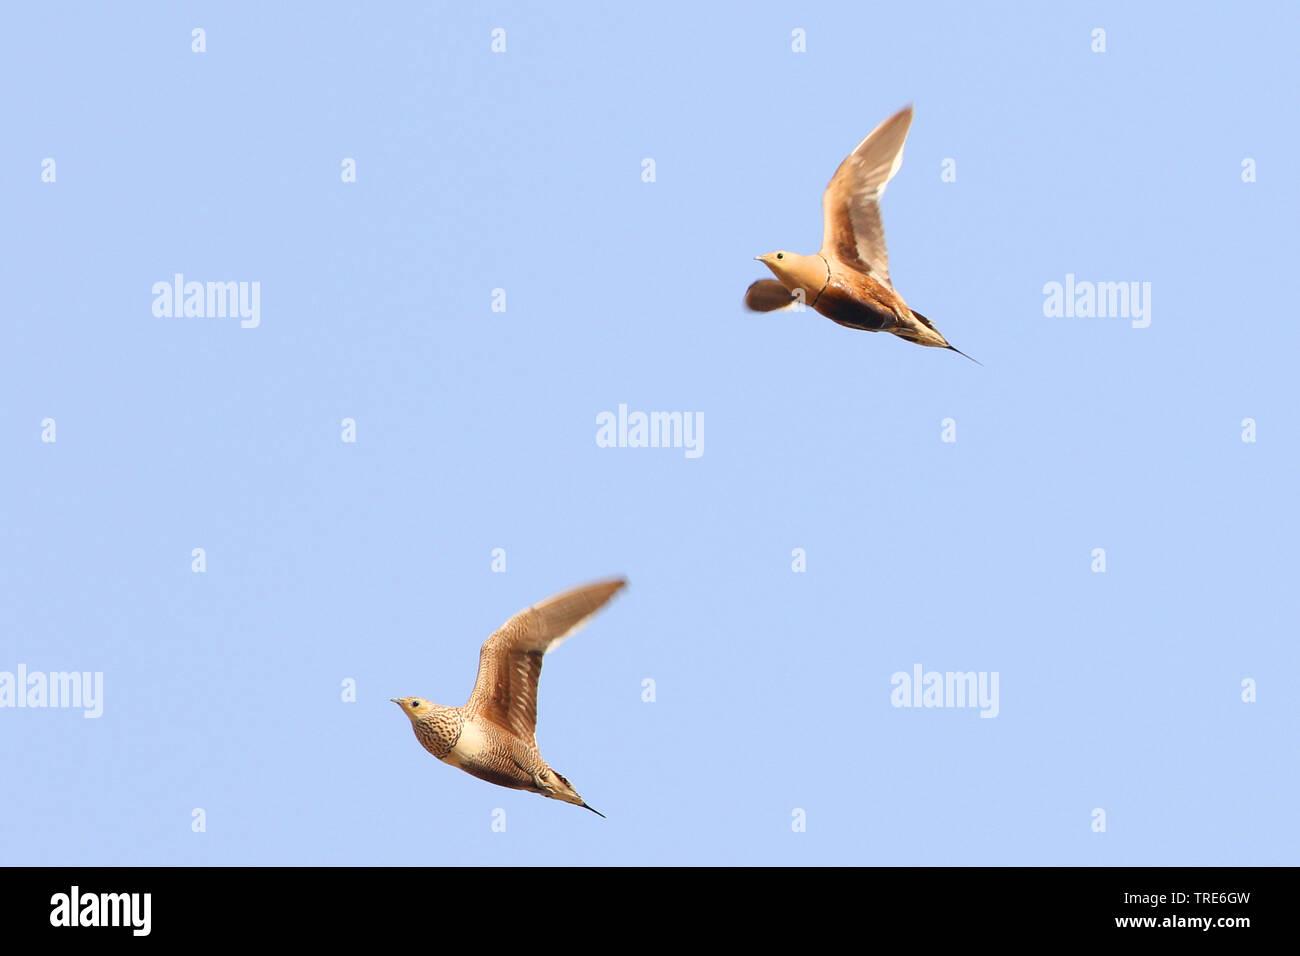 chestnut-bellied sandgrouse (Pterocles exustus), flying, Iran, Bandar Abbas Stock Photo